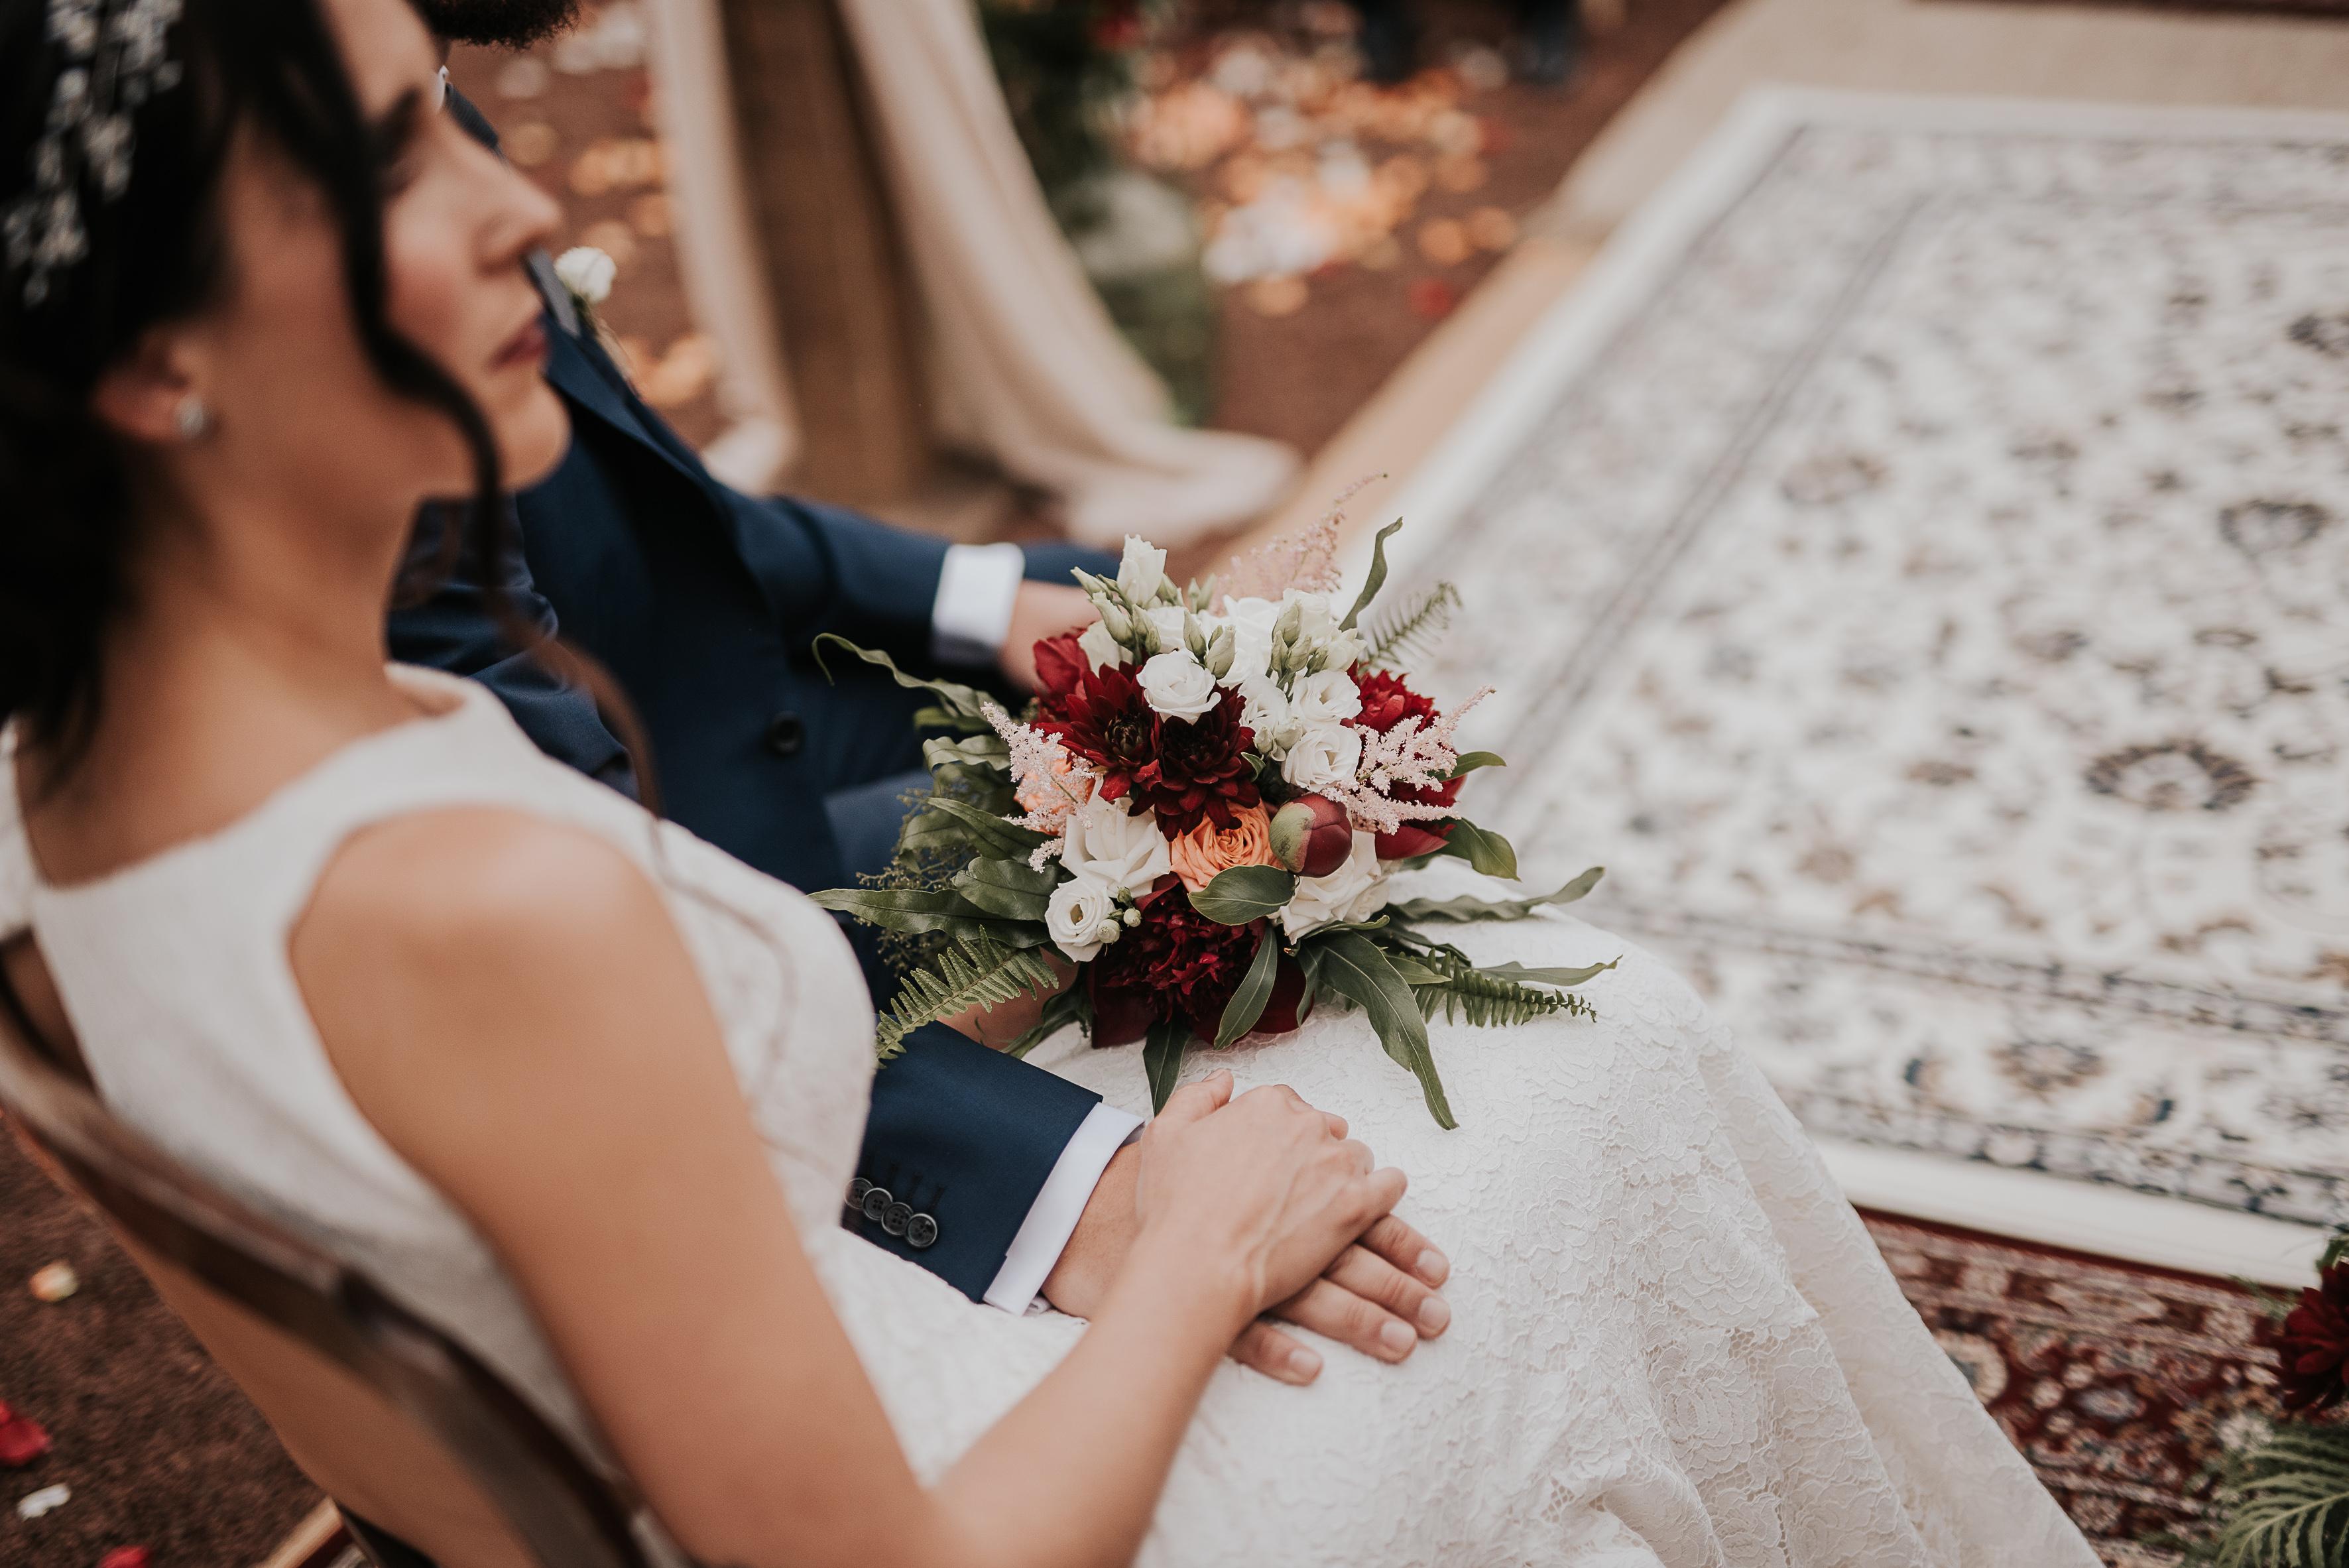 D-bodas wedding planners Tenerife